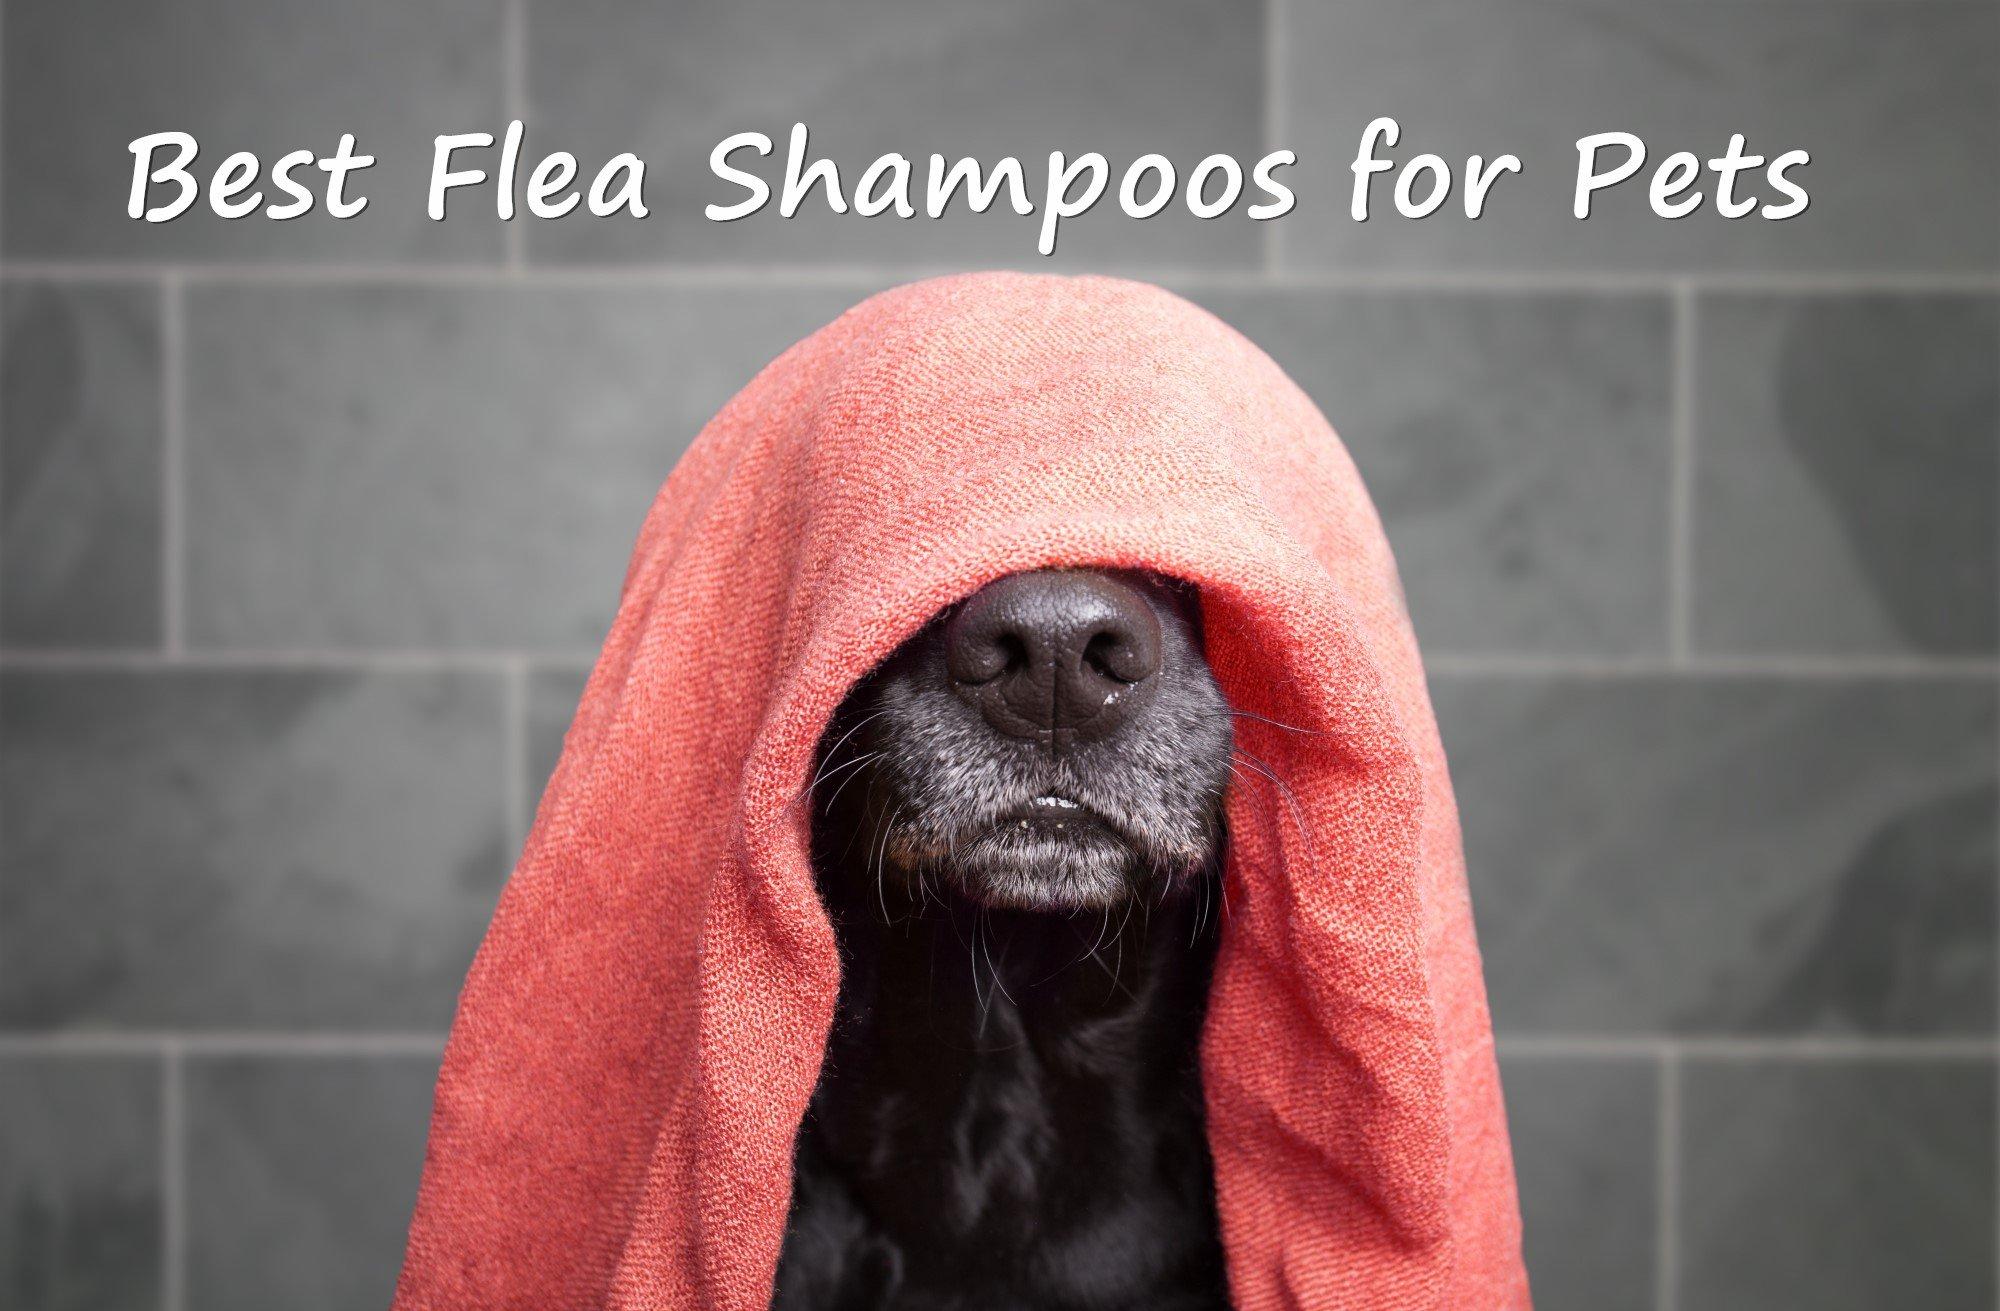 Best Flea Shampoos for Pets